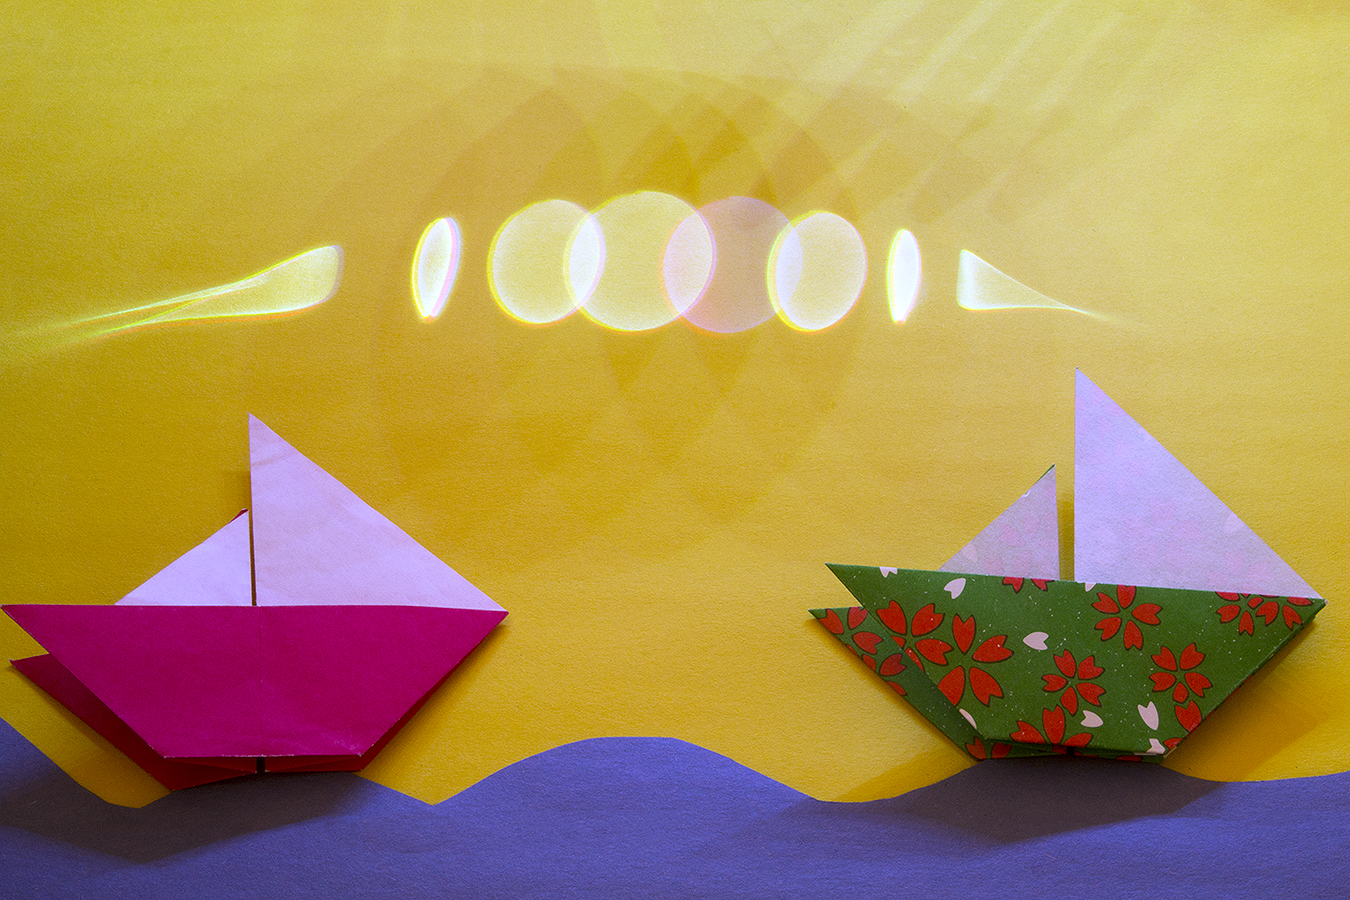 22_Sailing_Jonathan_Tang_UPenn_Tony_Ward_Studio_Long_Exposure_Low_Light_LED_Optics_Origami_Paper_Waves_Sun